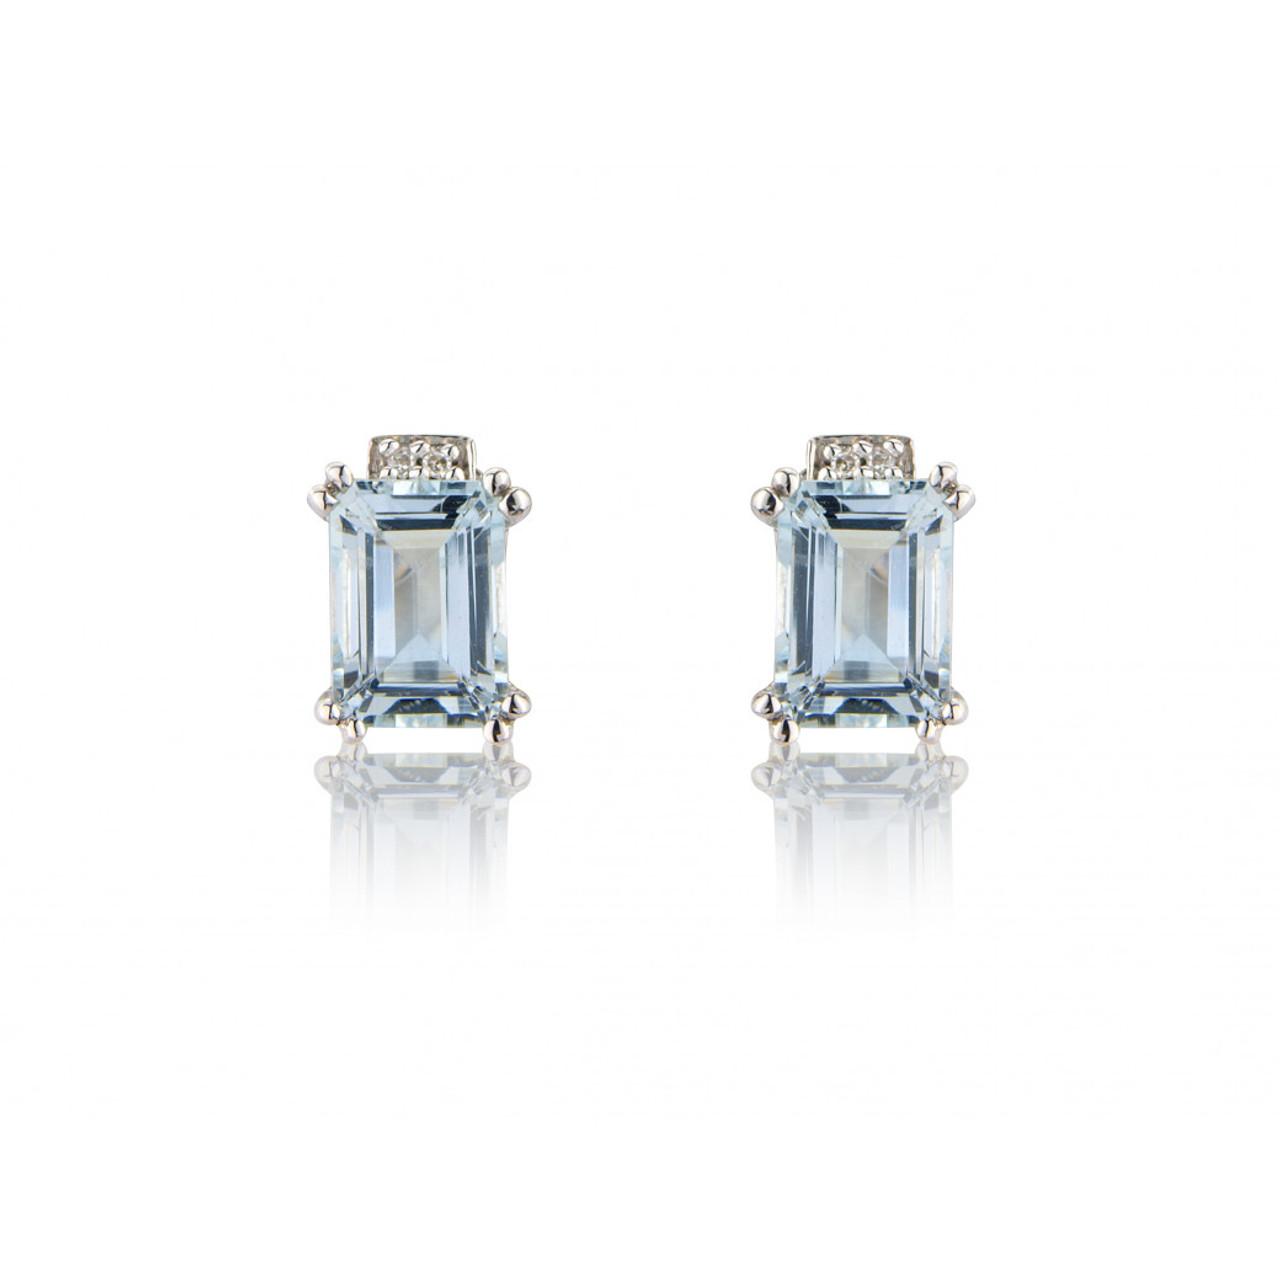 9ct White Gold Diamond & Aquamarine Stud Earrings